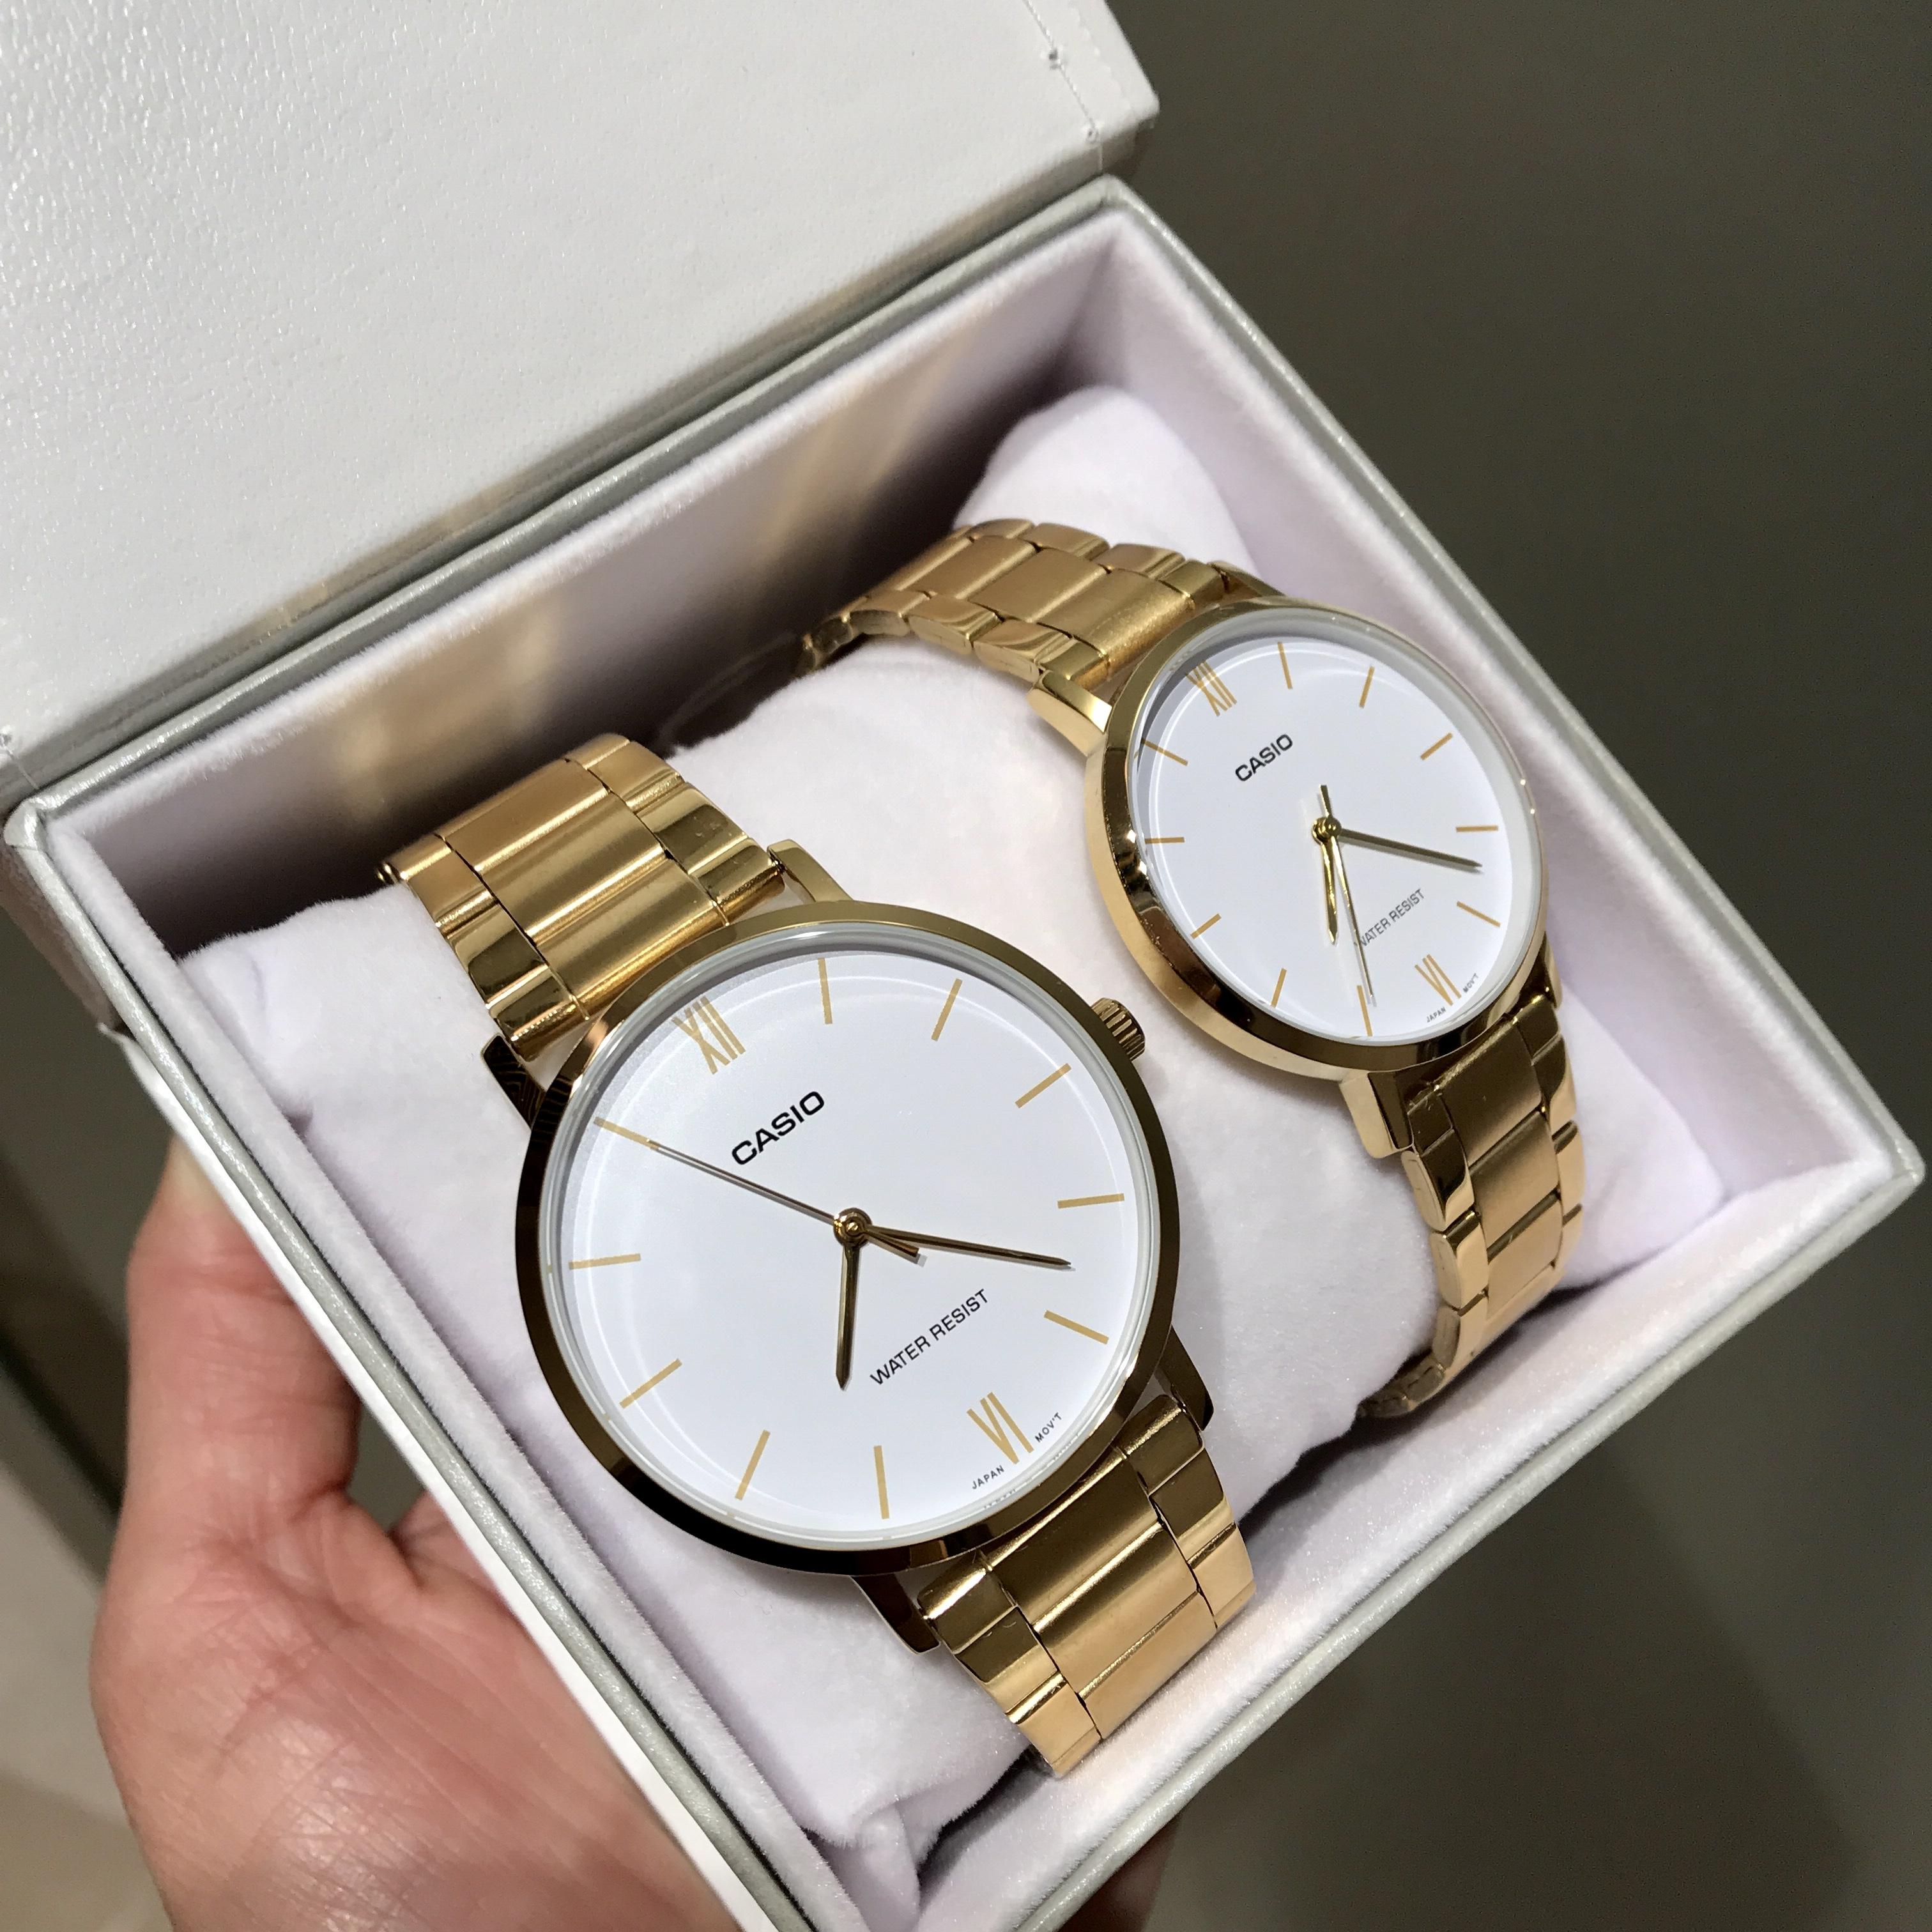 casio 小金表正品石英电子手表机械情侣手表一对 卡西欧手表男黑金